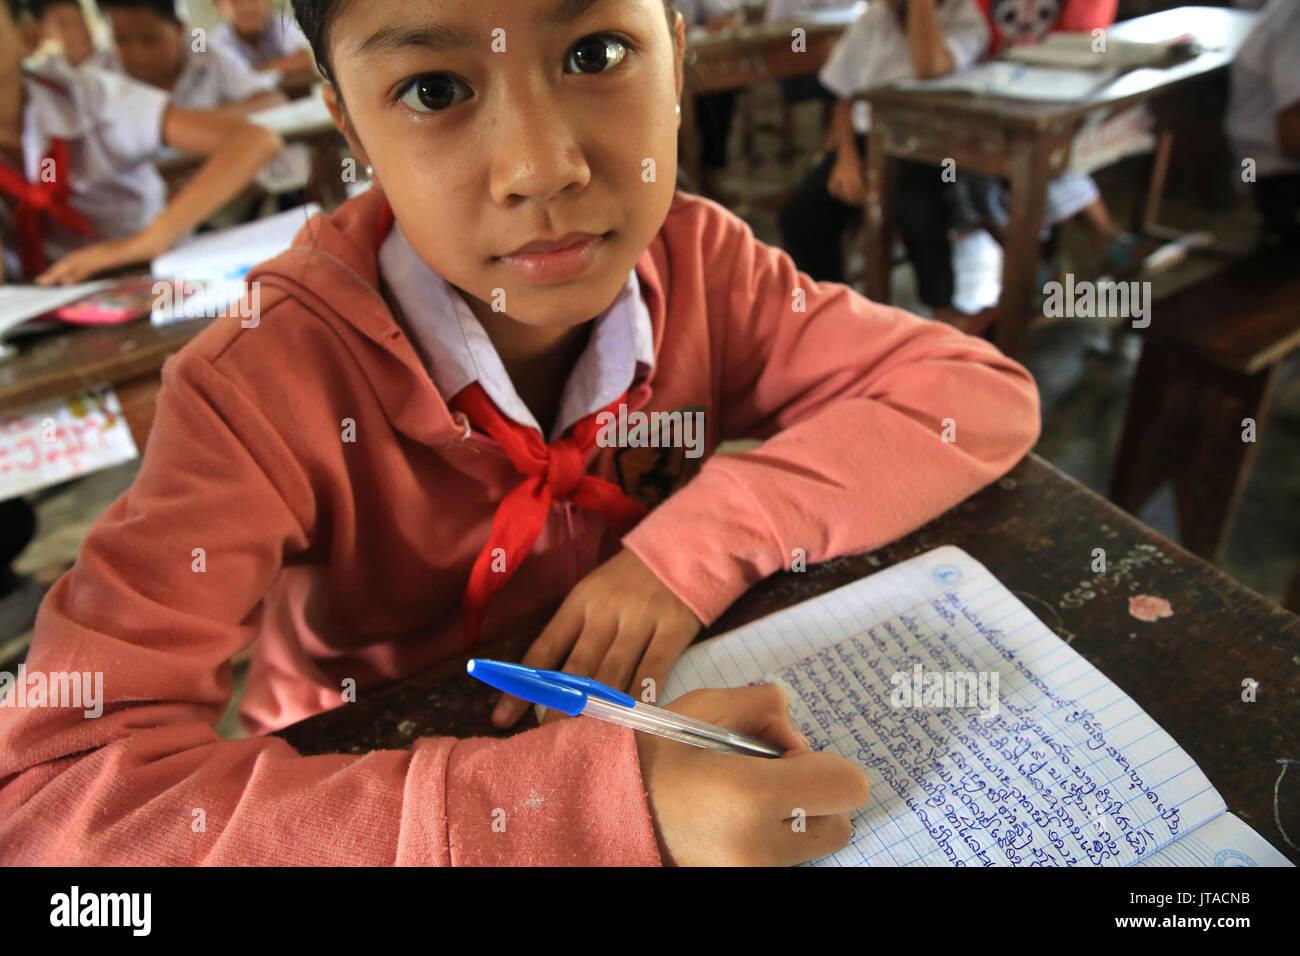 Laotian schoolgirl, Elementary School, Vieng Vang, Laos, Indochina, Southeast Asia, Asia - Stock Image